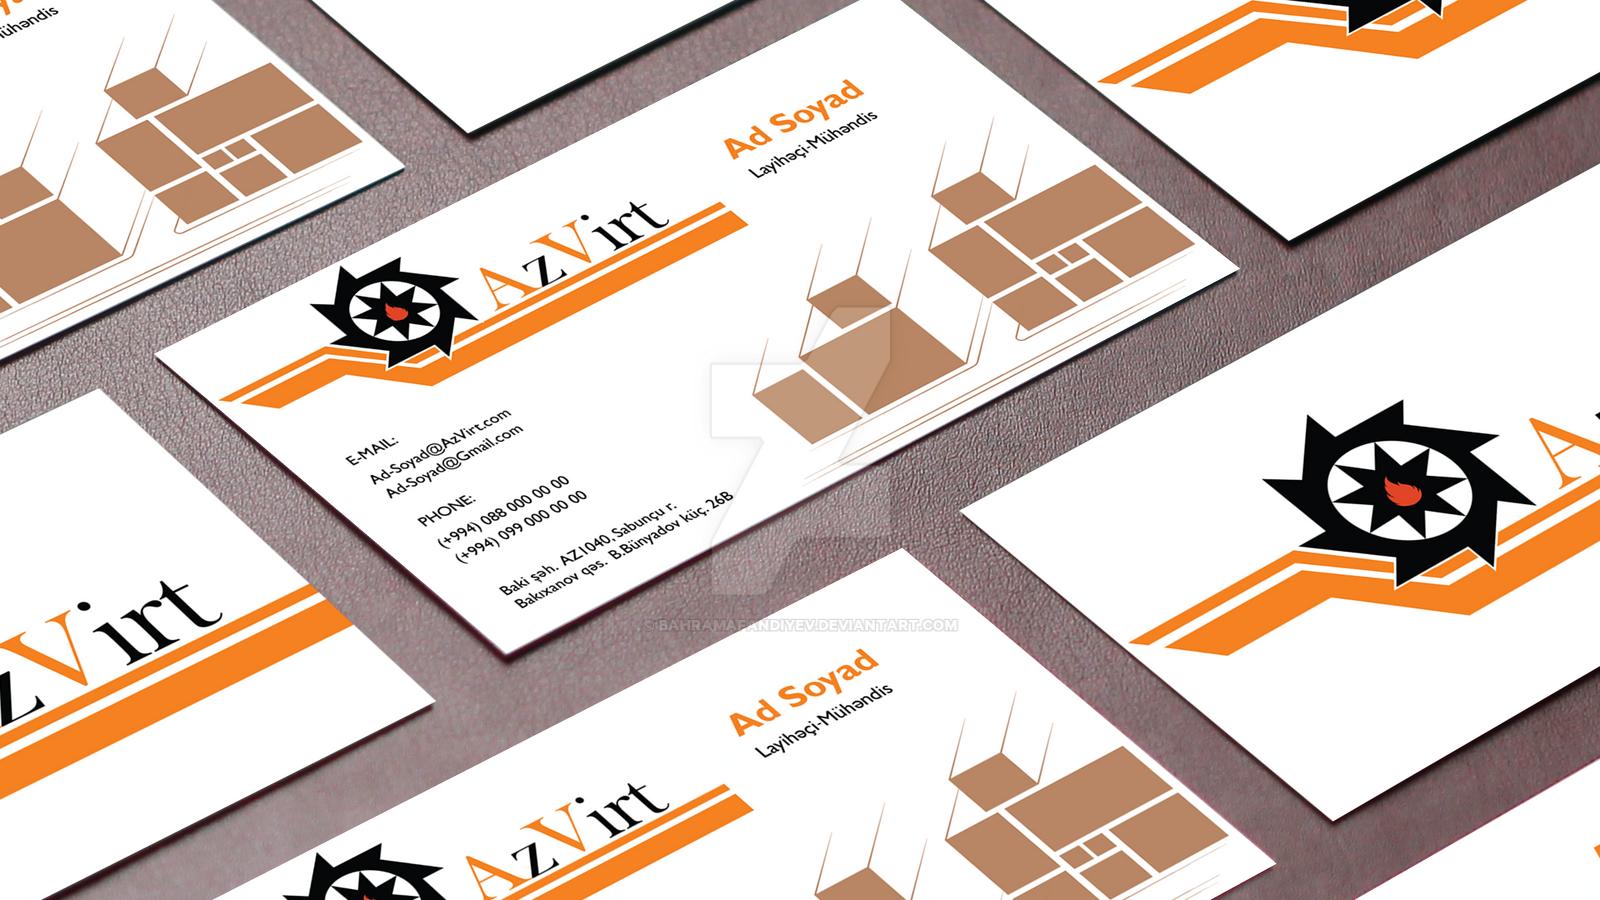 Business card azvirt by bahramafandiyev on deviantart business card azvirt by bahramafandiyev business card azvirt by bahramafandiyev magicingreecefo Gallery